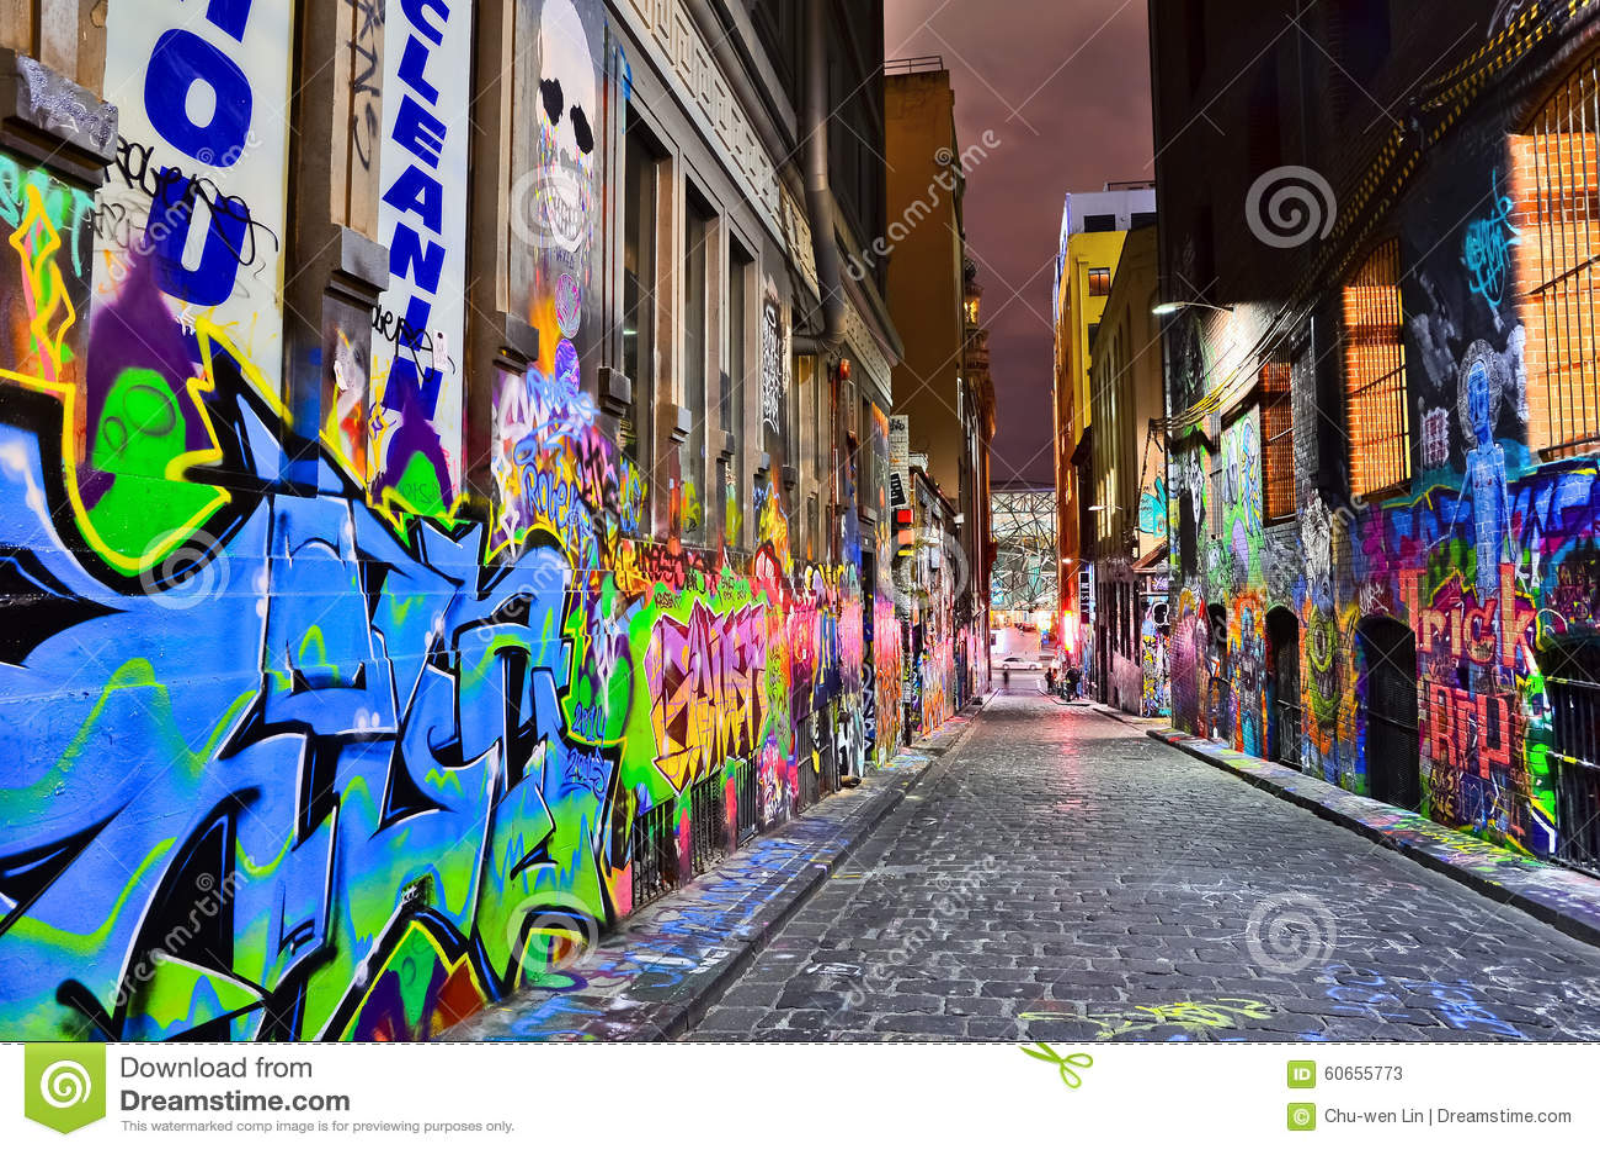 Night View Of Colorful Graffiti Artwork In Melbourne